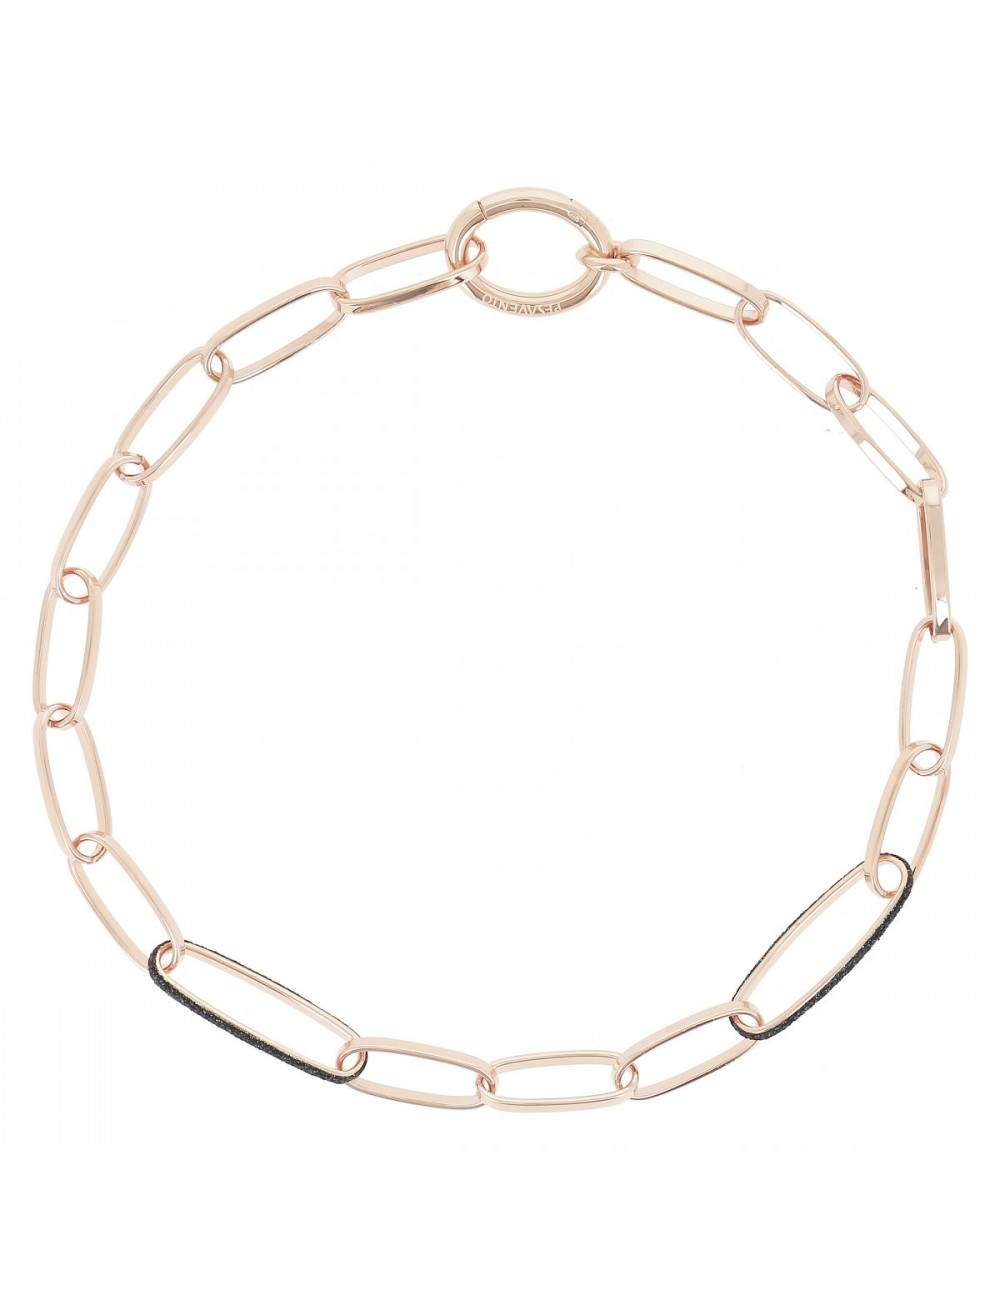 Pesavento -Collar Pesavento eslabones plata baño oro rosa -WPLVE1823